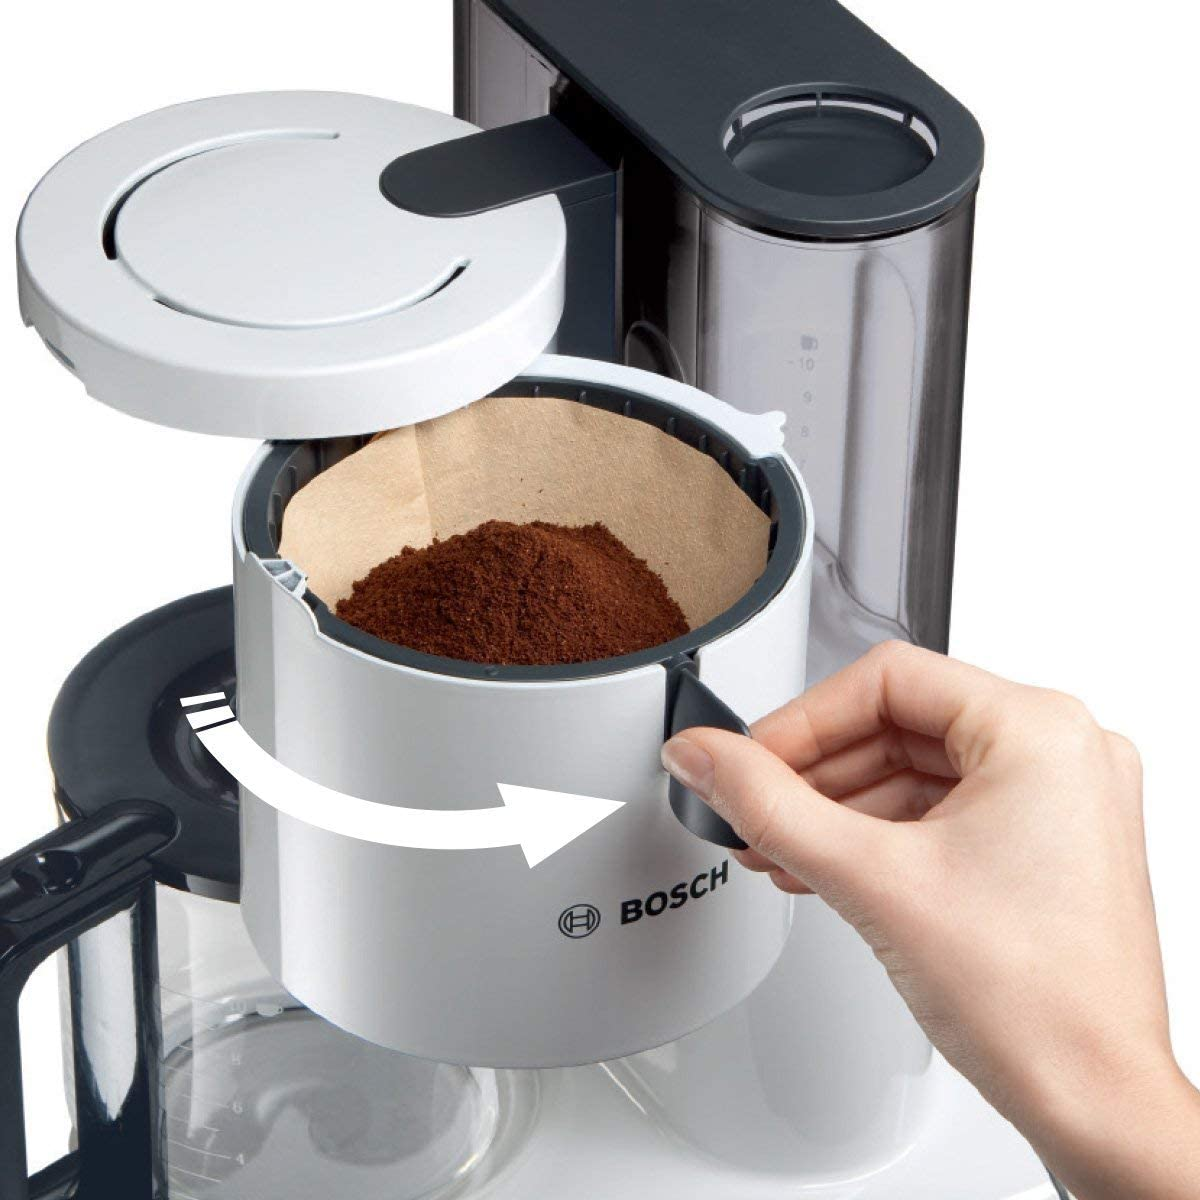 pl/ástico 1160 W Blanco//Plata 14 Cups Bosch Styline Cafetera de filtro